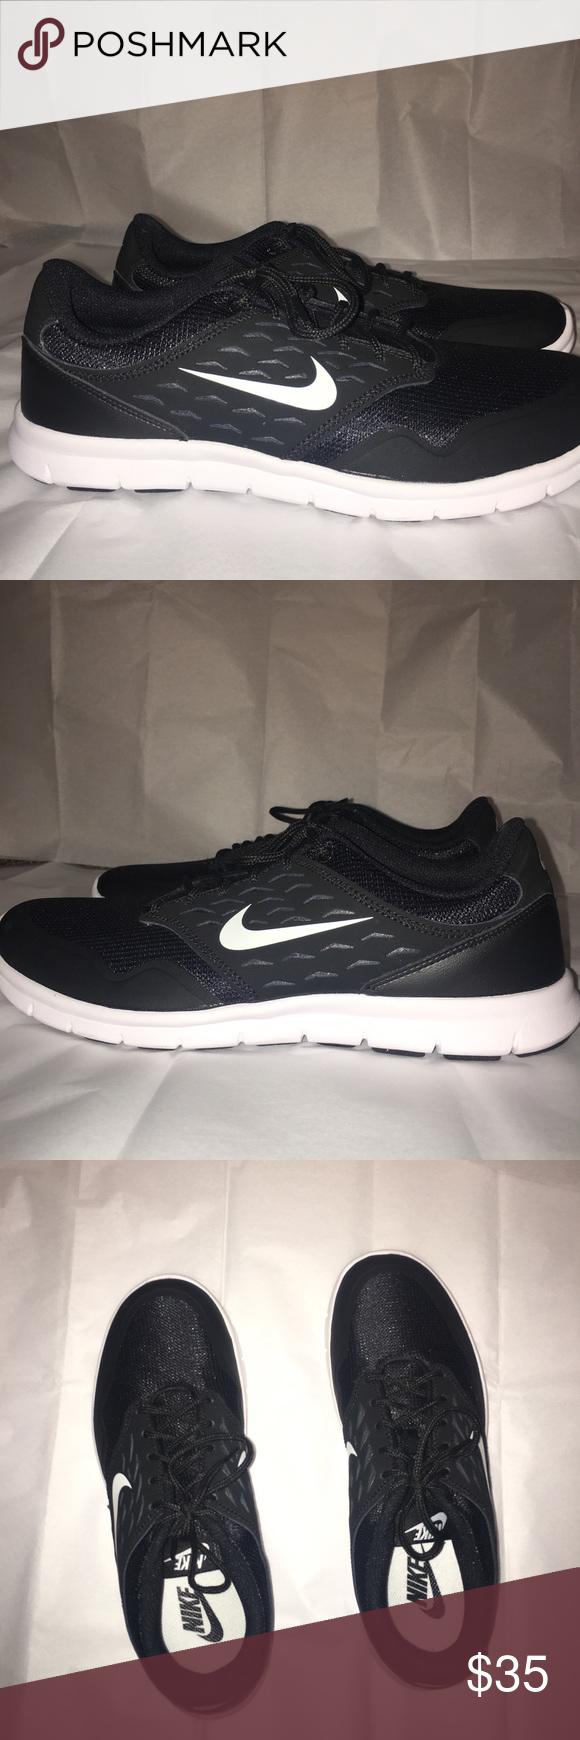 Discontinued Black Nike Shoe | Black